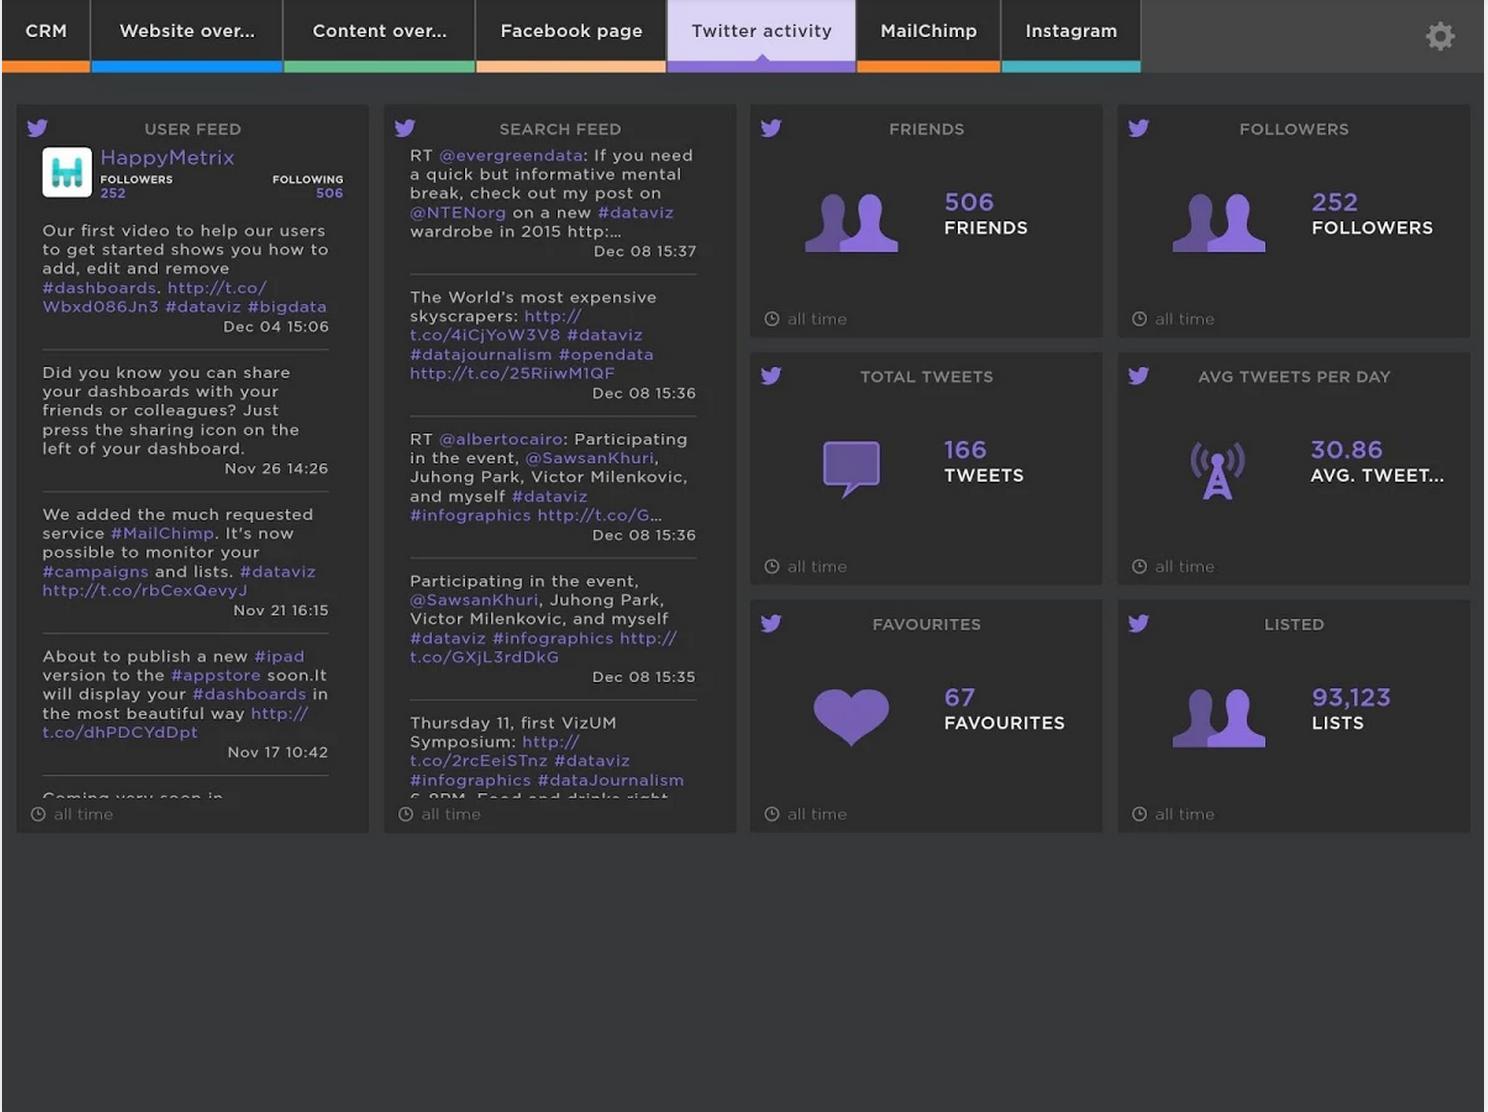 HappyMetrix Software - Twitter activity